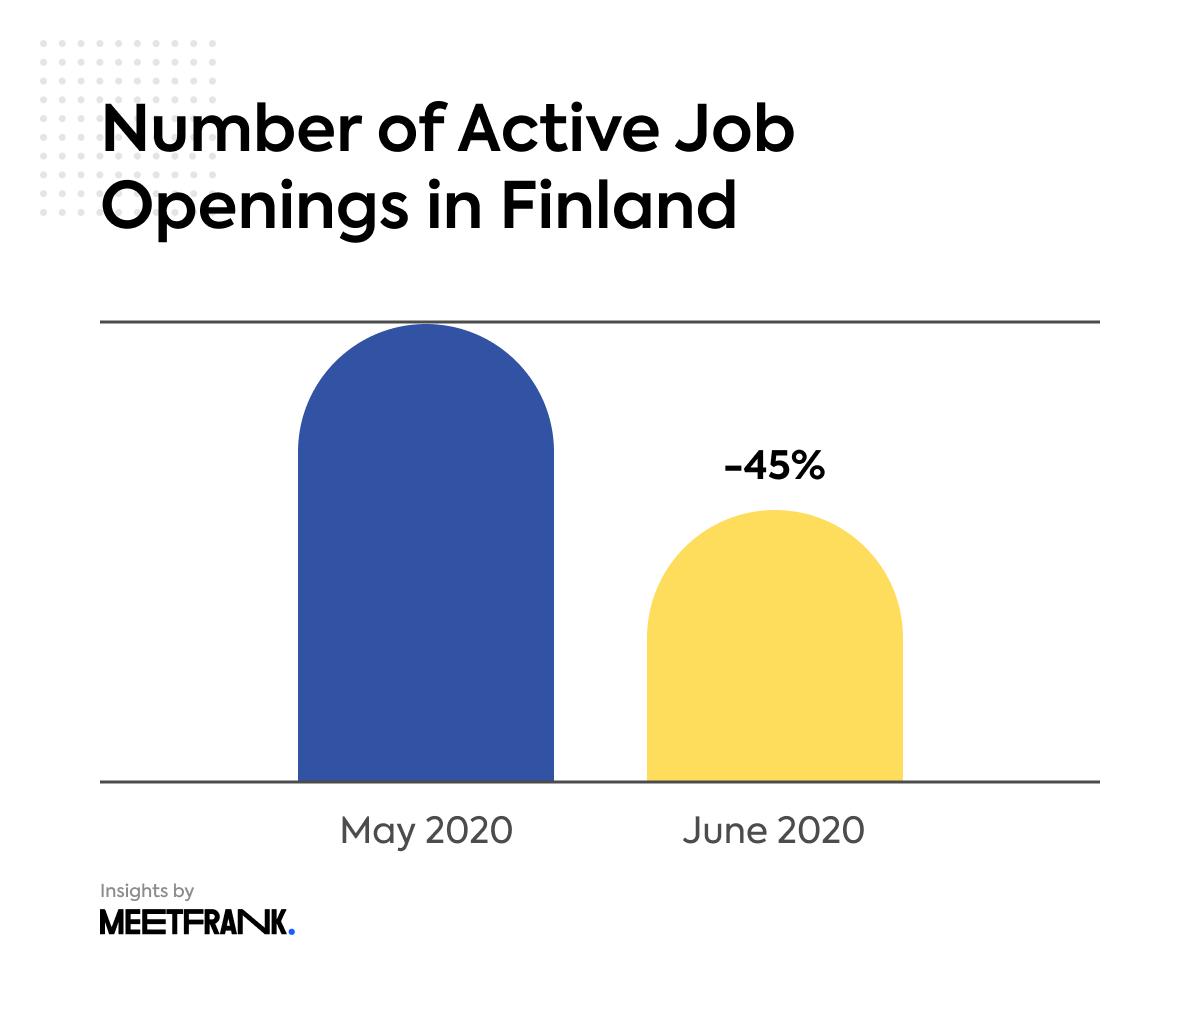 active job openings in Finland